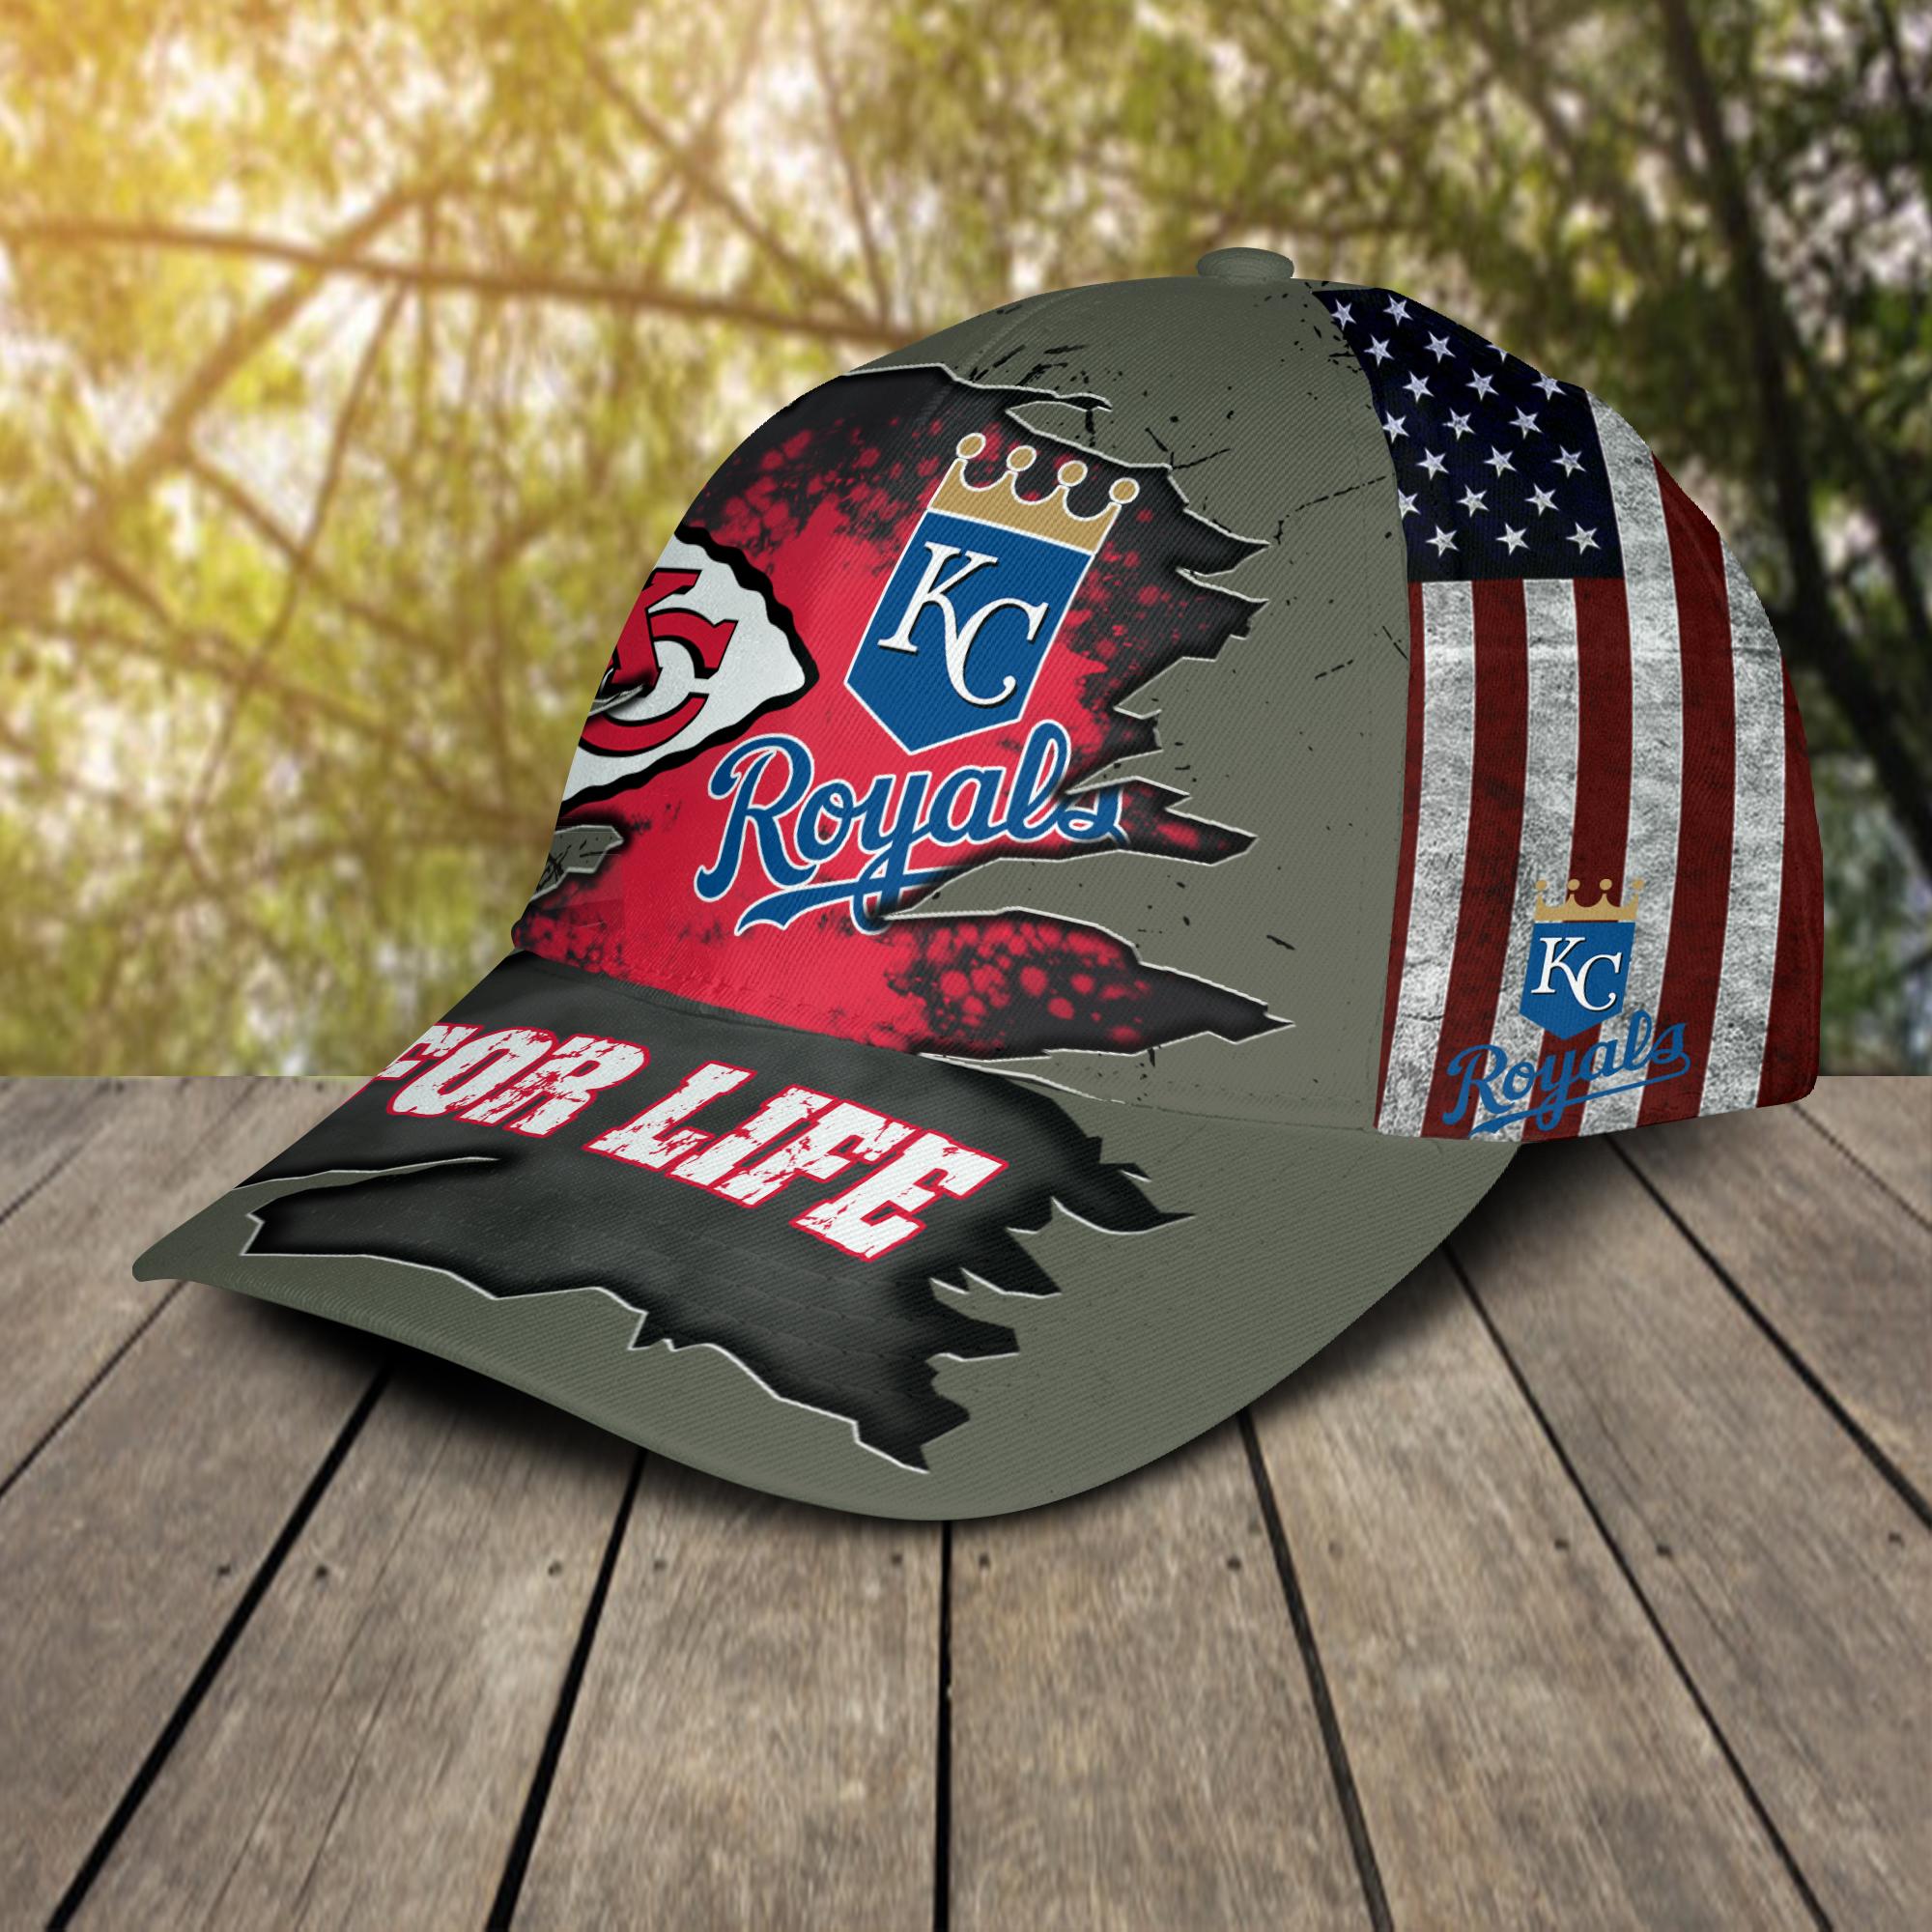 Kansas City Chiefs and Kansas City Royals For Life Hat Cap -2